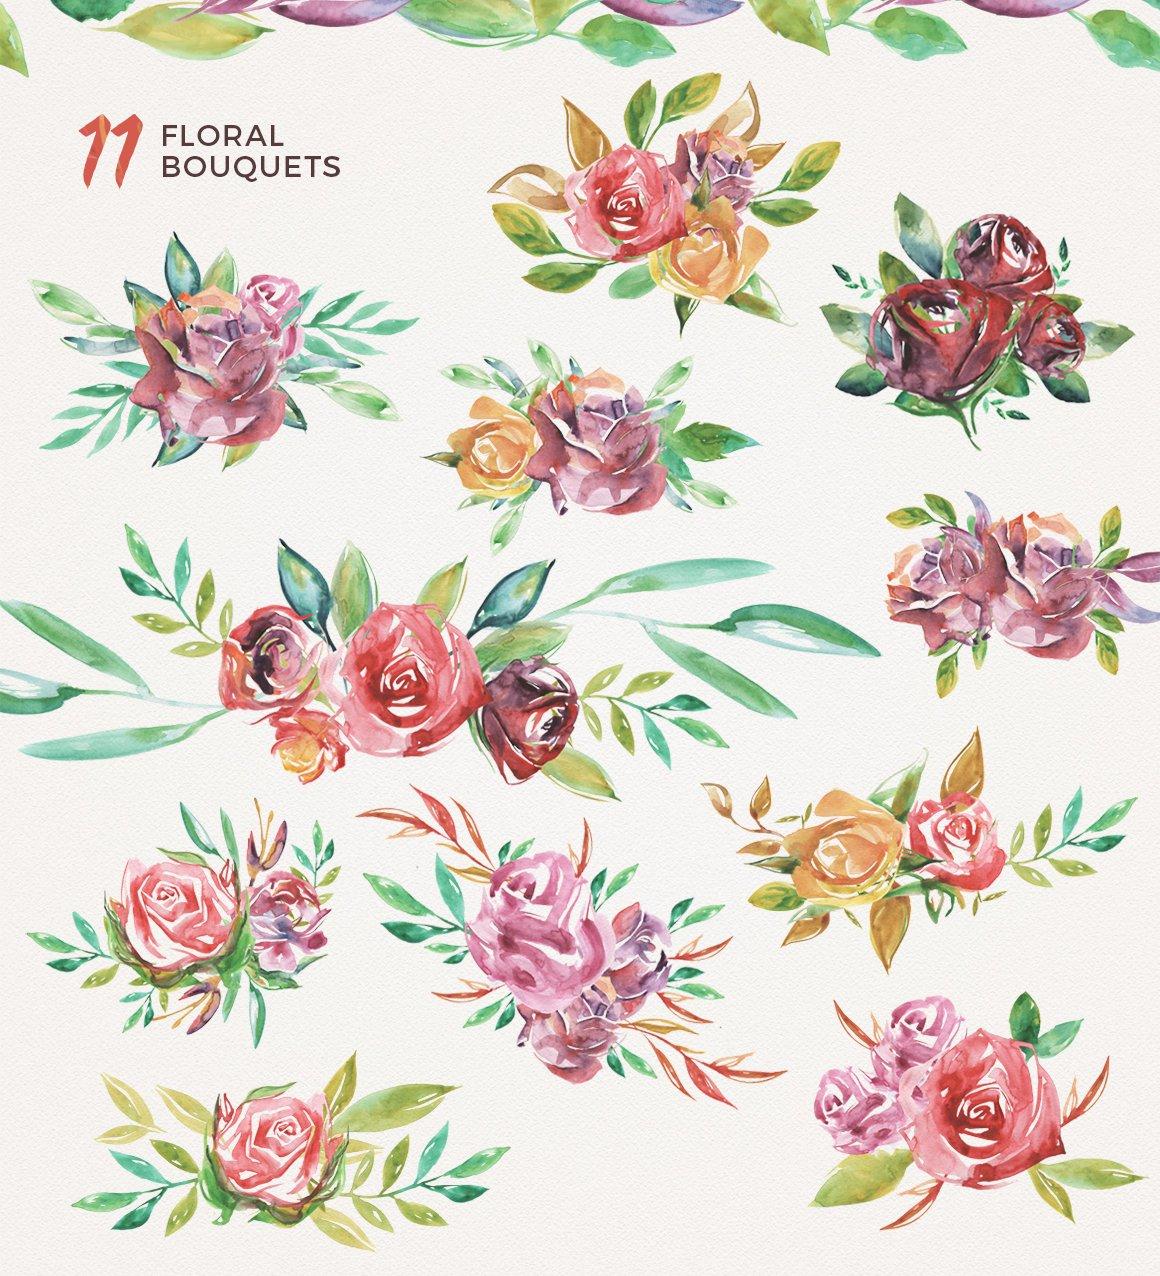 高清手绘花卉树叶水彩剪贴画PNG免抠图片素材 Watercolor Handmade Design Bundle插图(2)